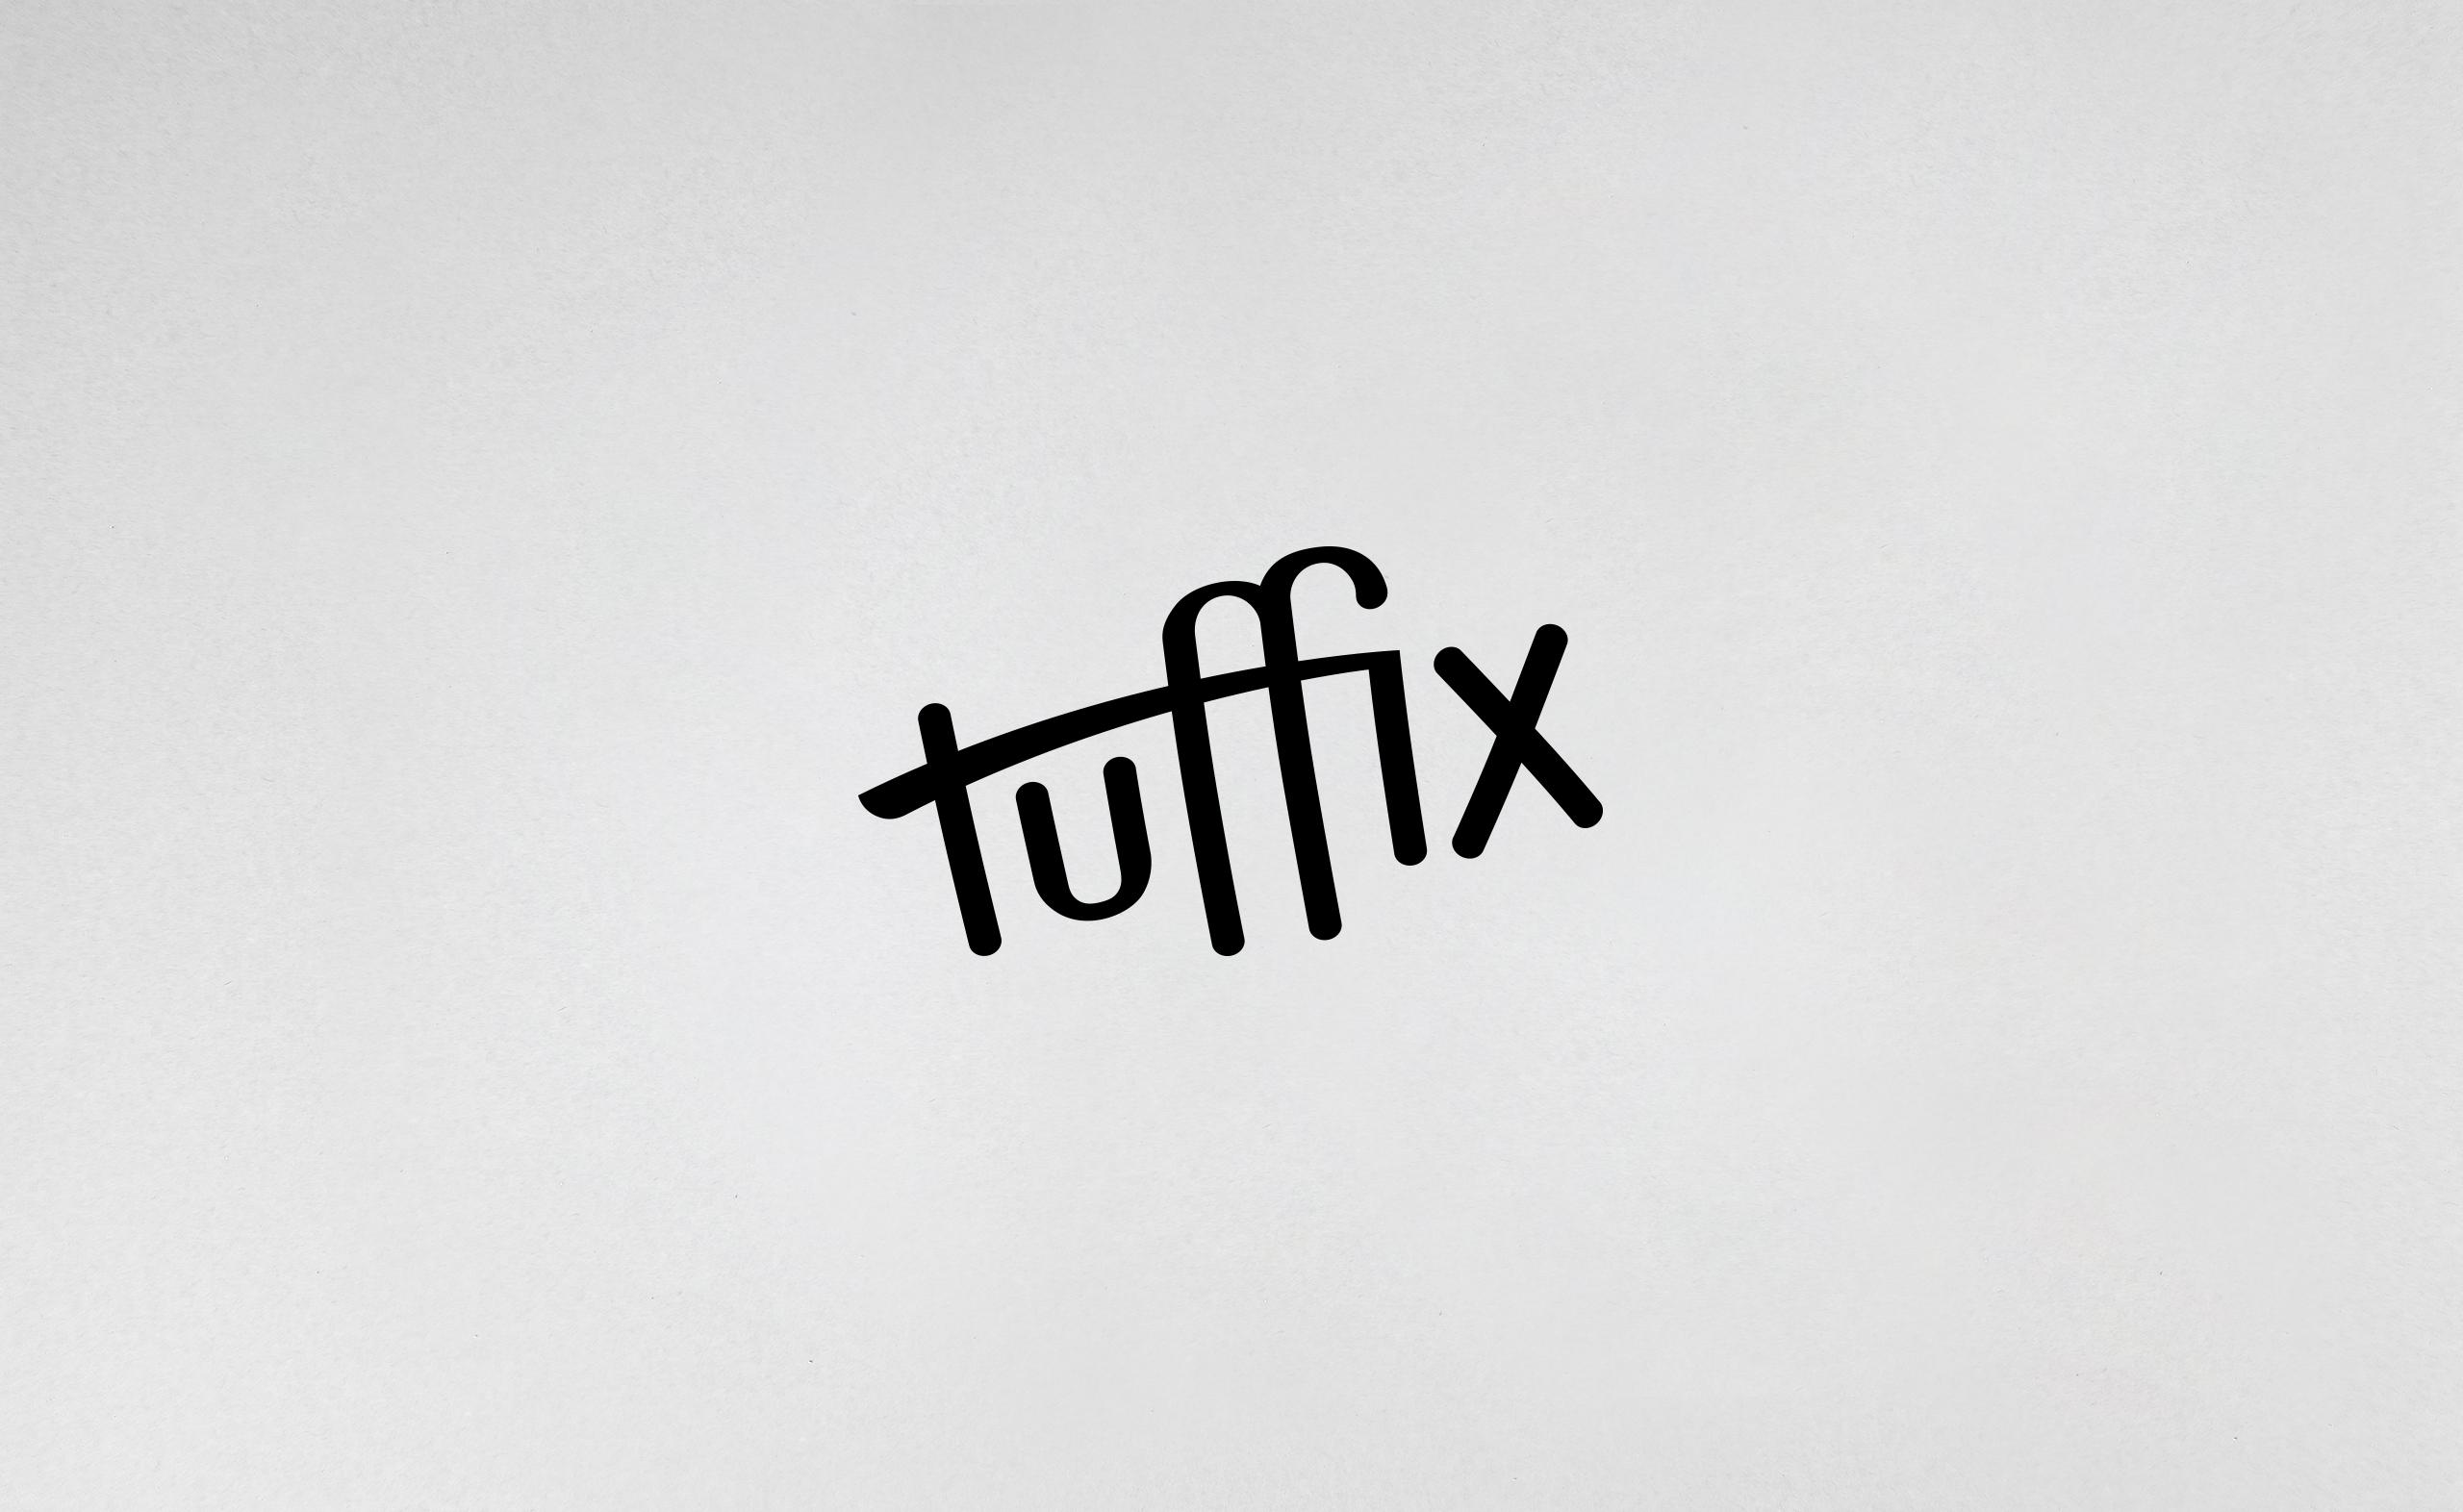 Tuffix Mail Tube